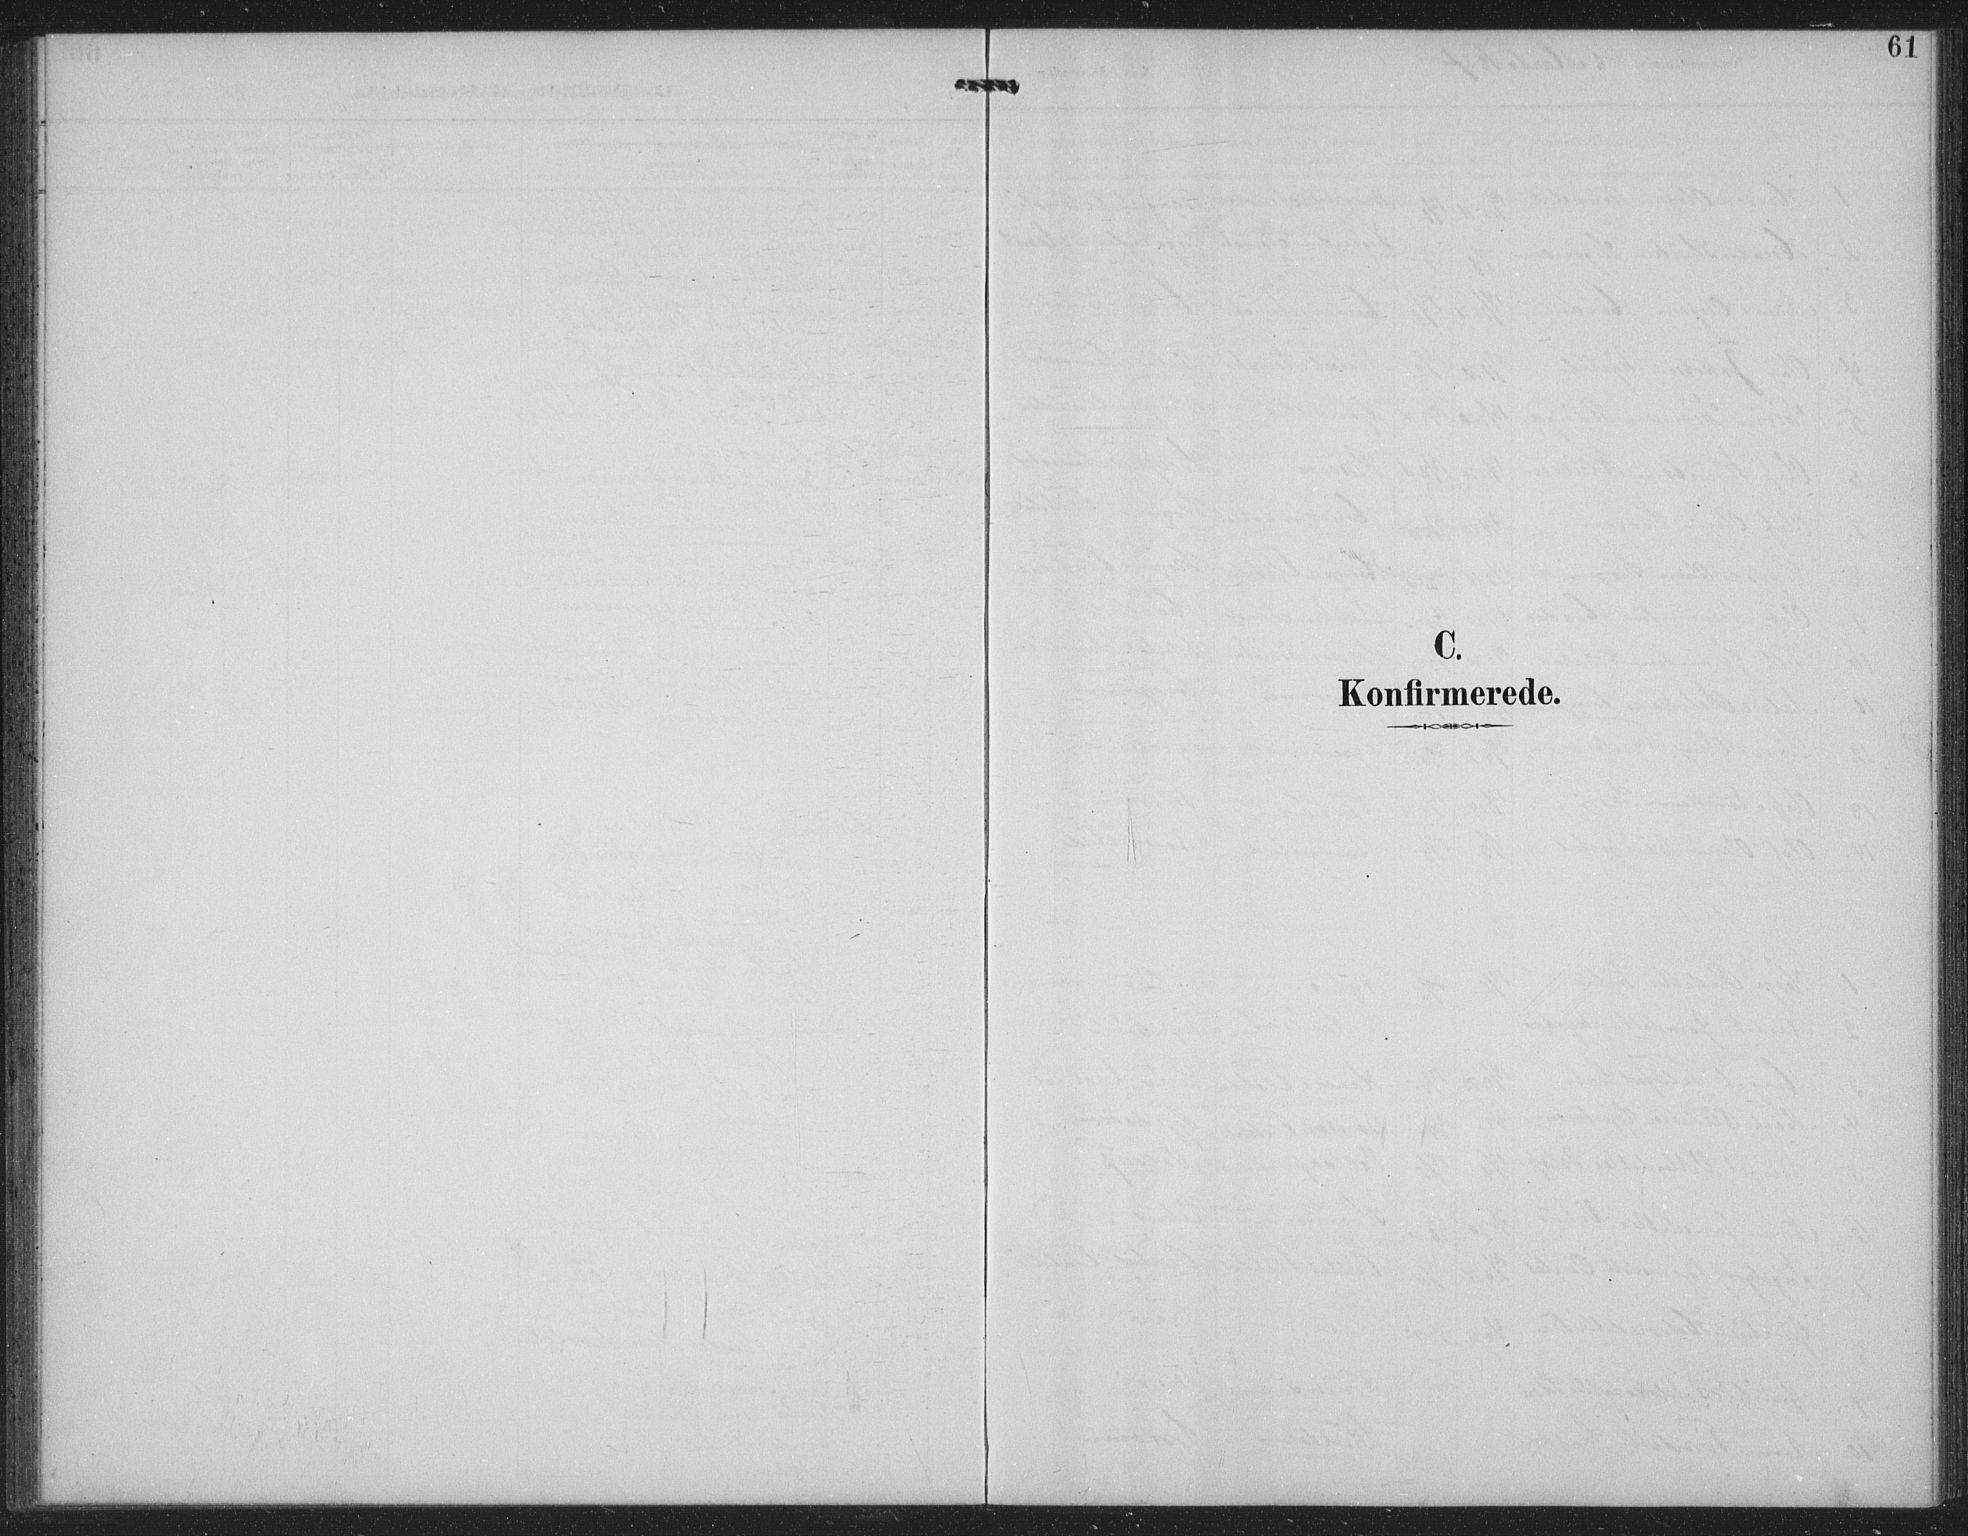 SAKO, Seljord kirkebøker, G/Gc/L0003: Klokkerbok nr. III 3, 1887-1926, s. 61